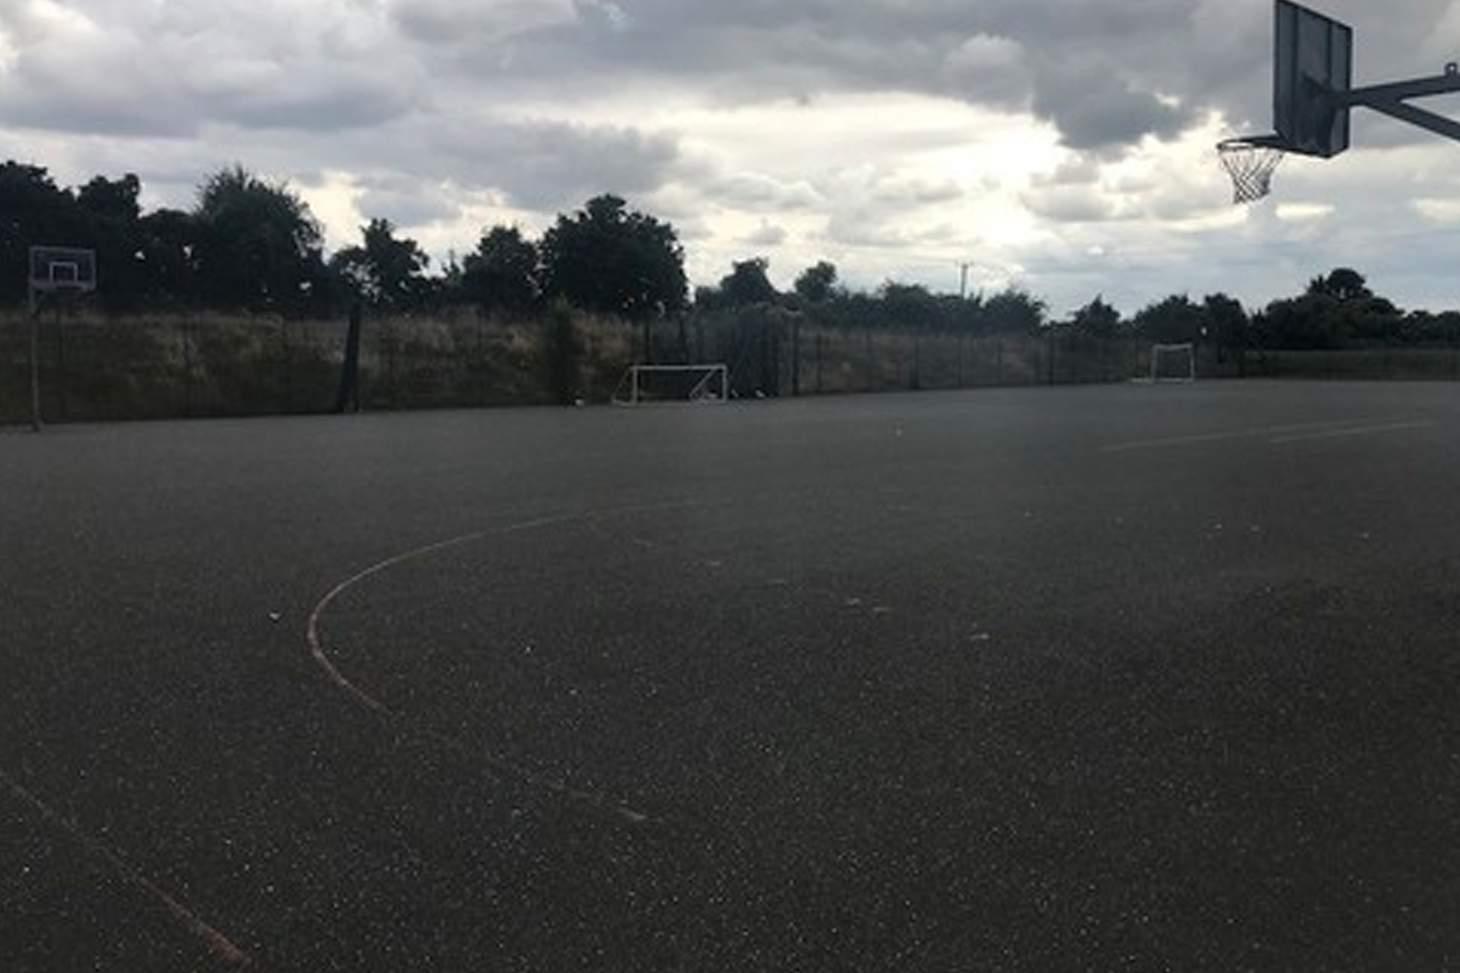 Princes Risborough School 5 a side   Concrete football pitch